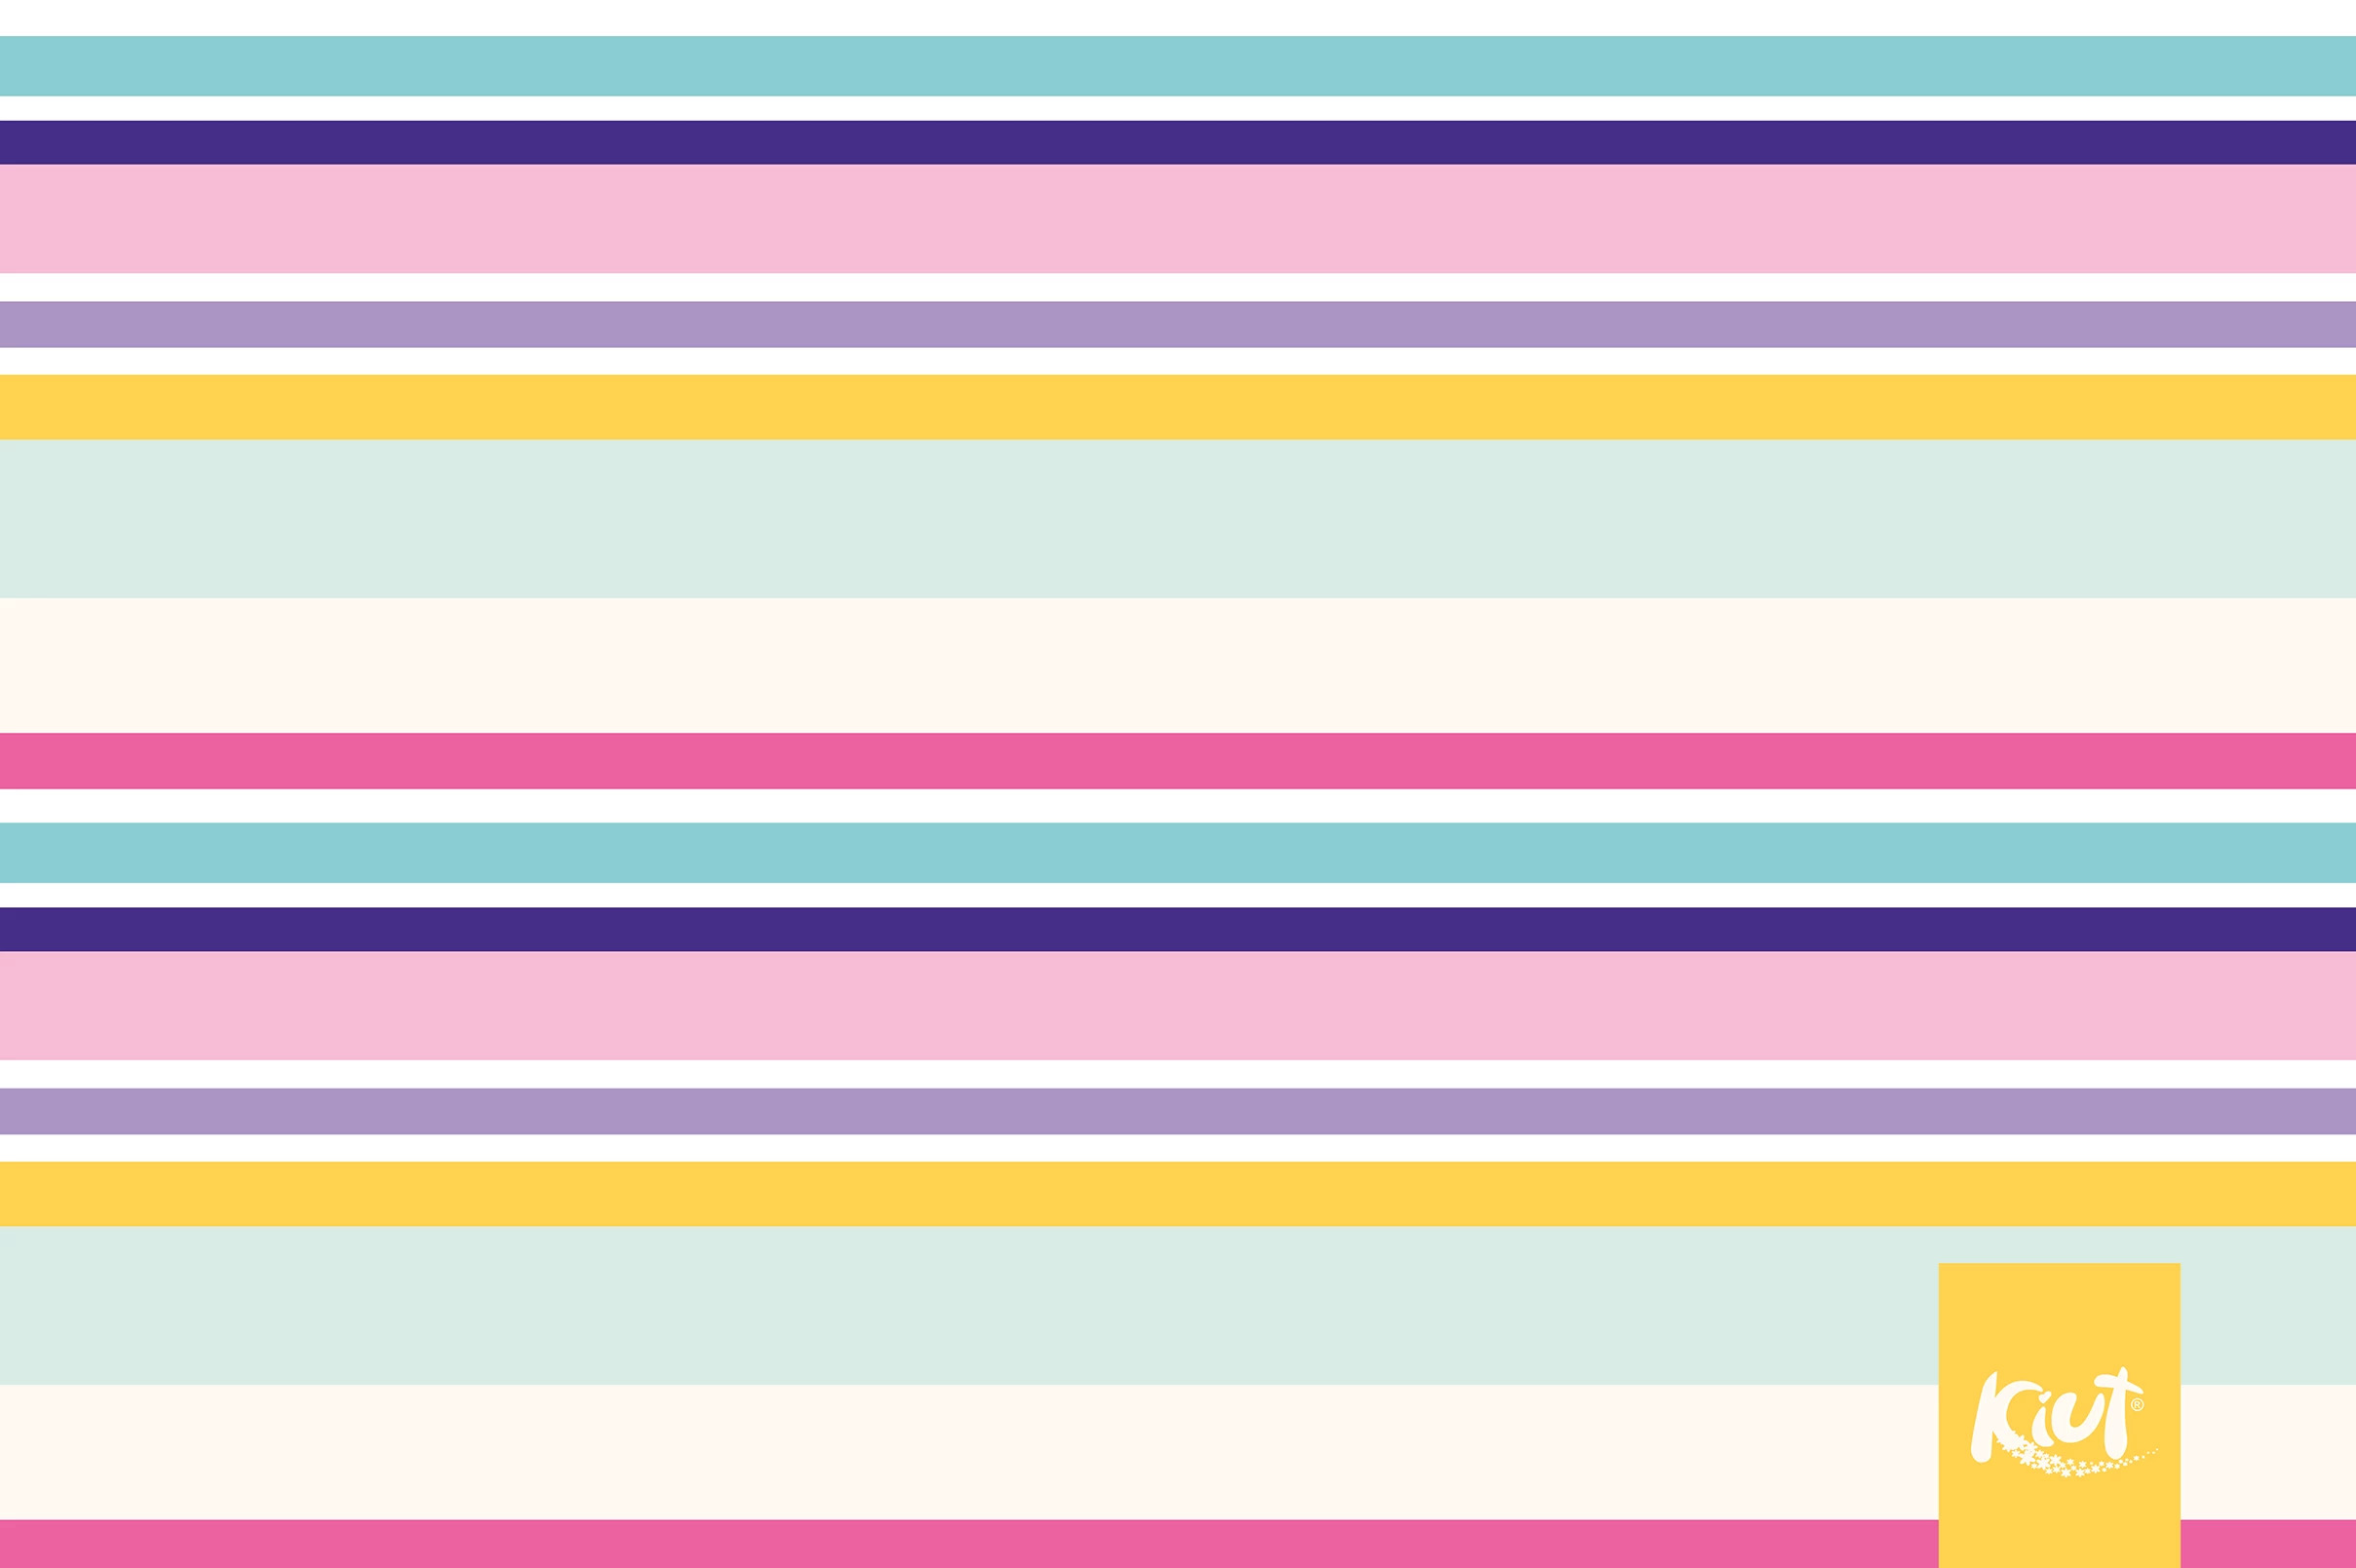 Fondos de pantalla Kiut Líneas de colores pasteles